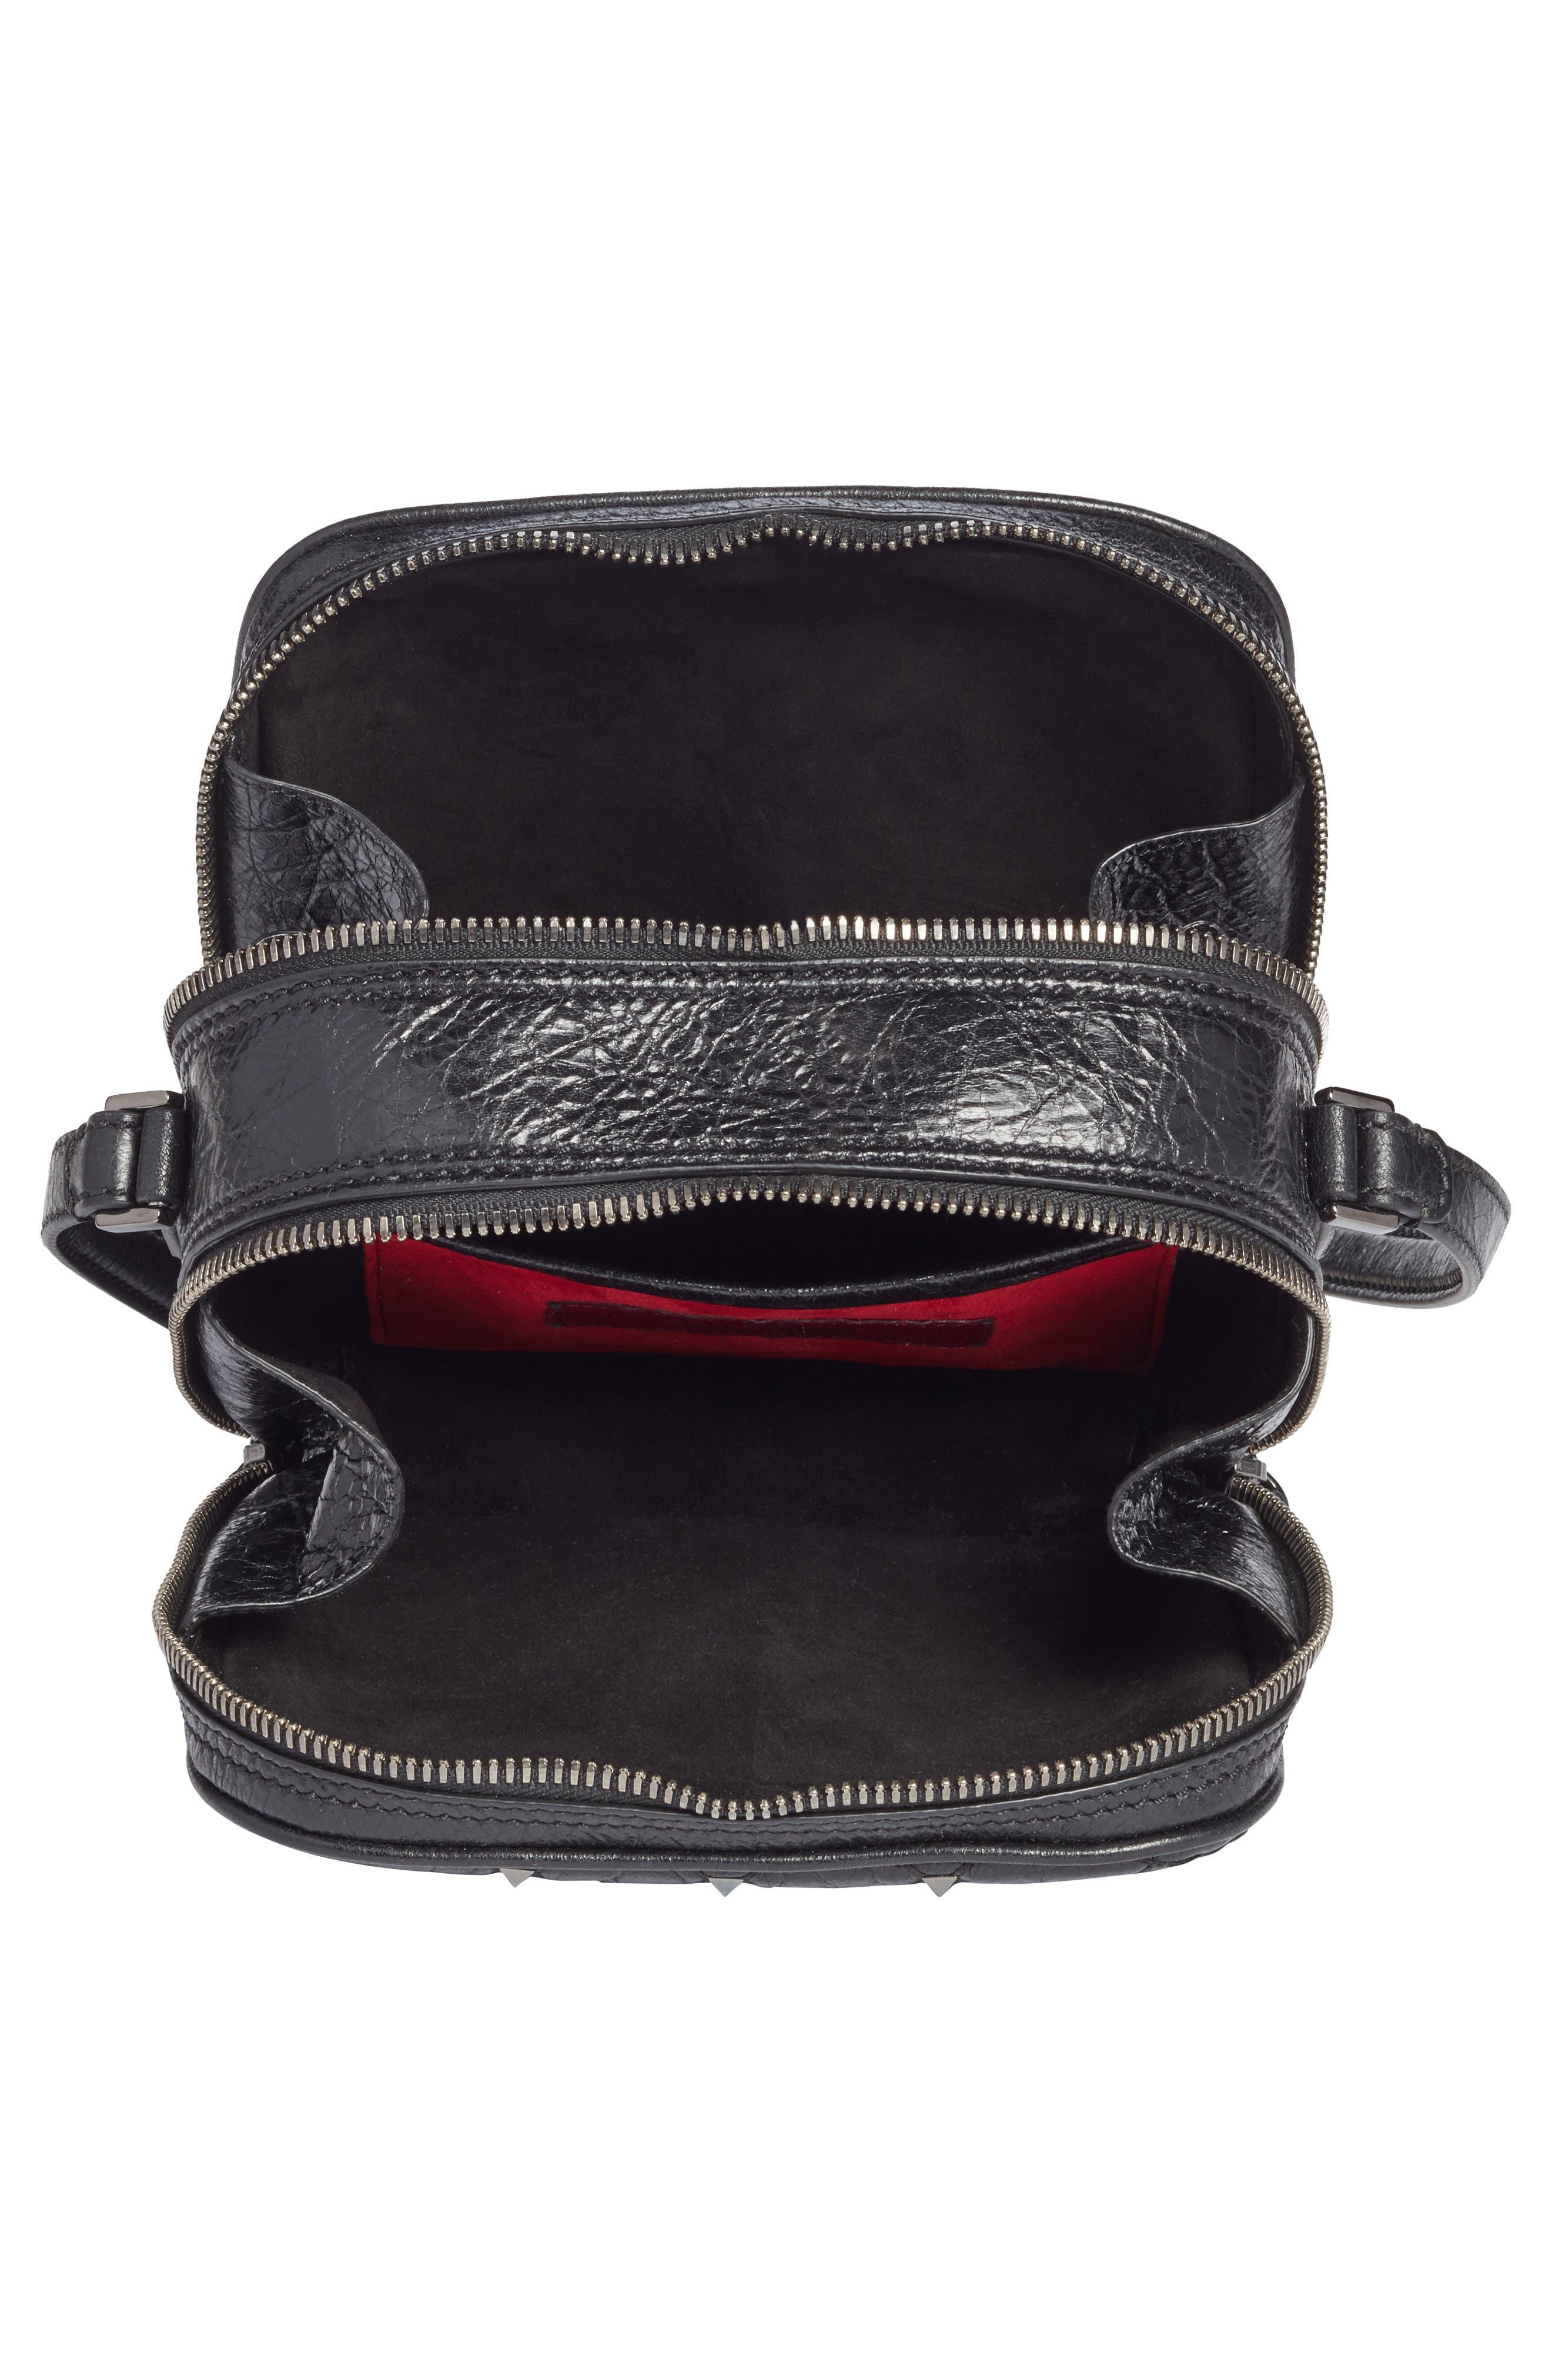 Rockstud Leather Camera Crossbody Bag,                             Alternate thumbnail 4, color,                             001